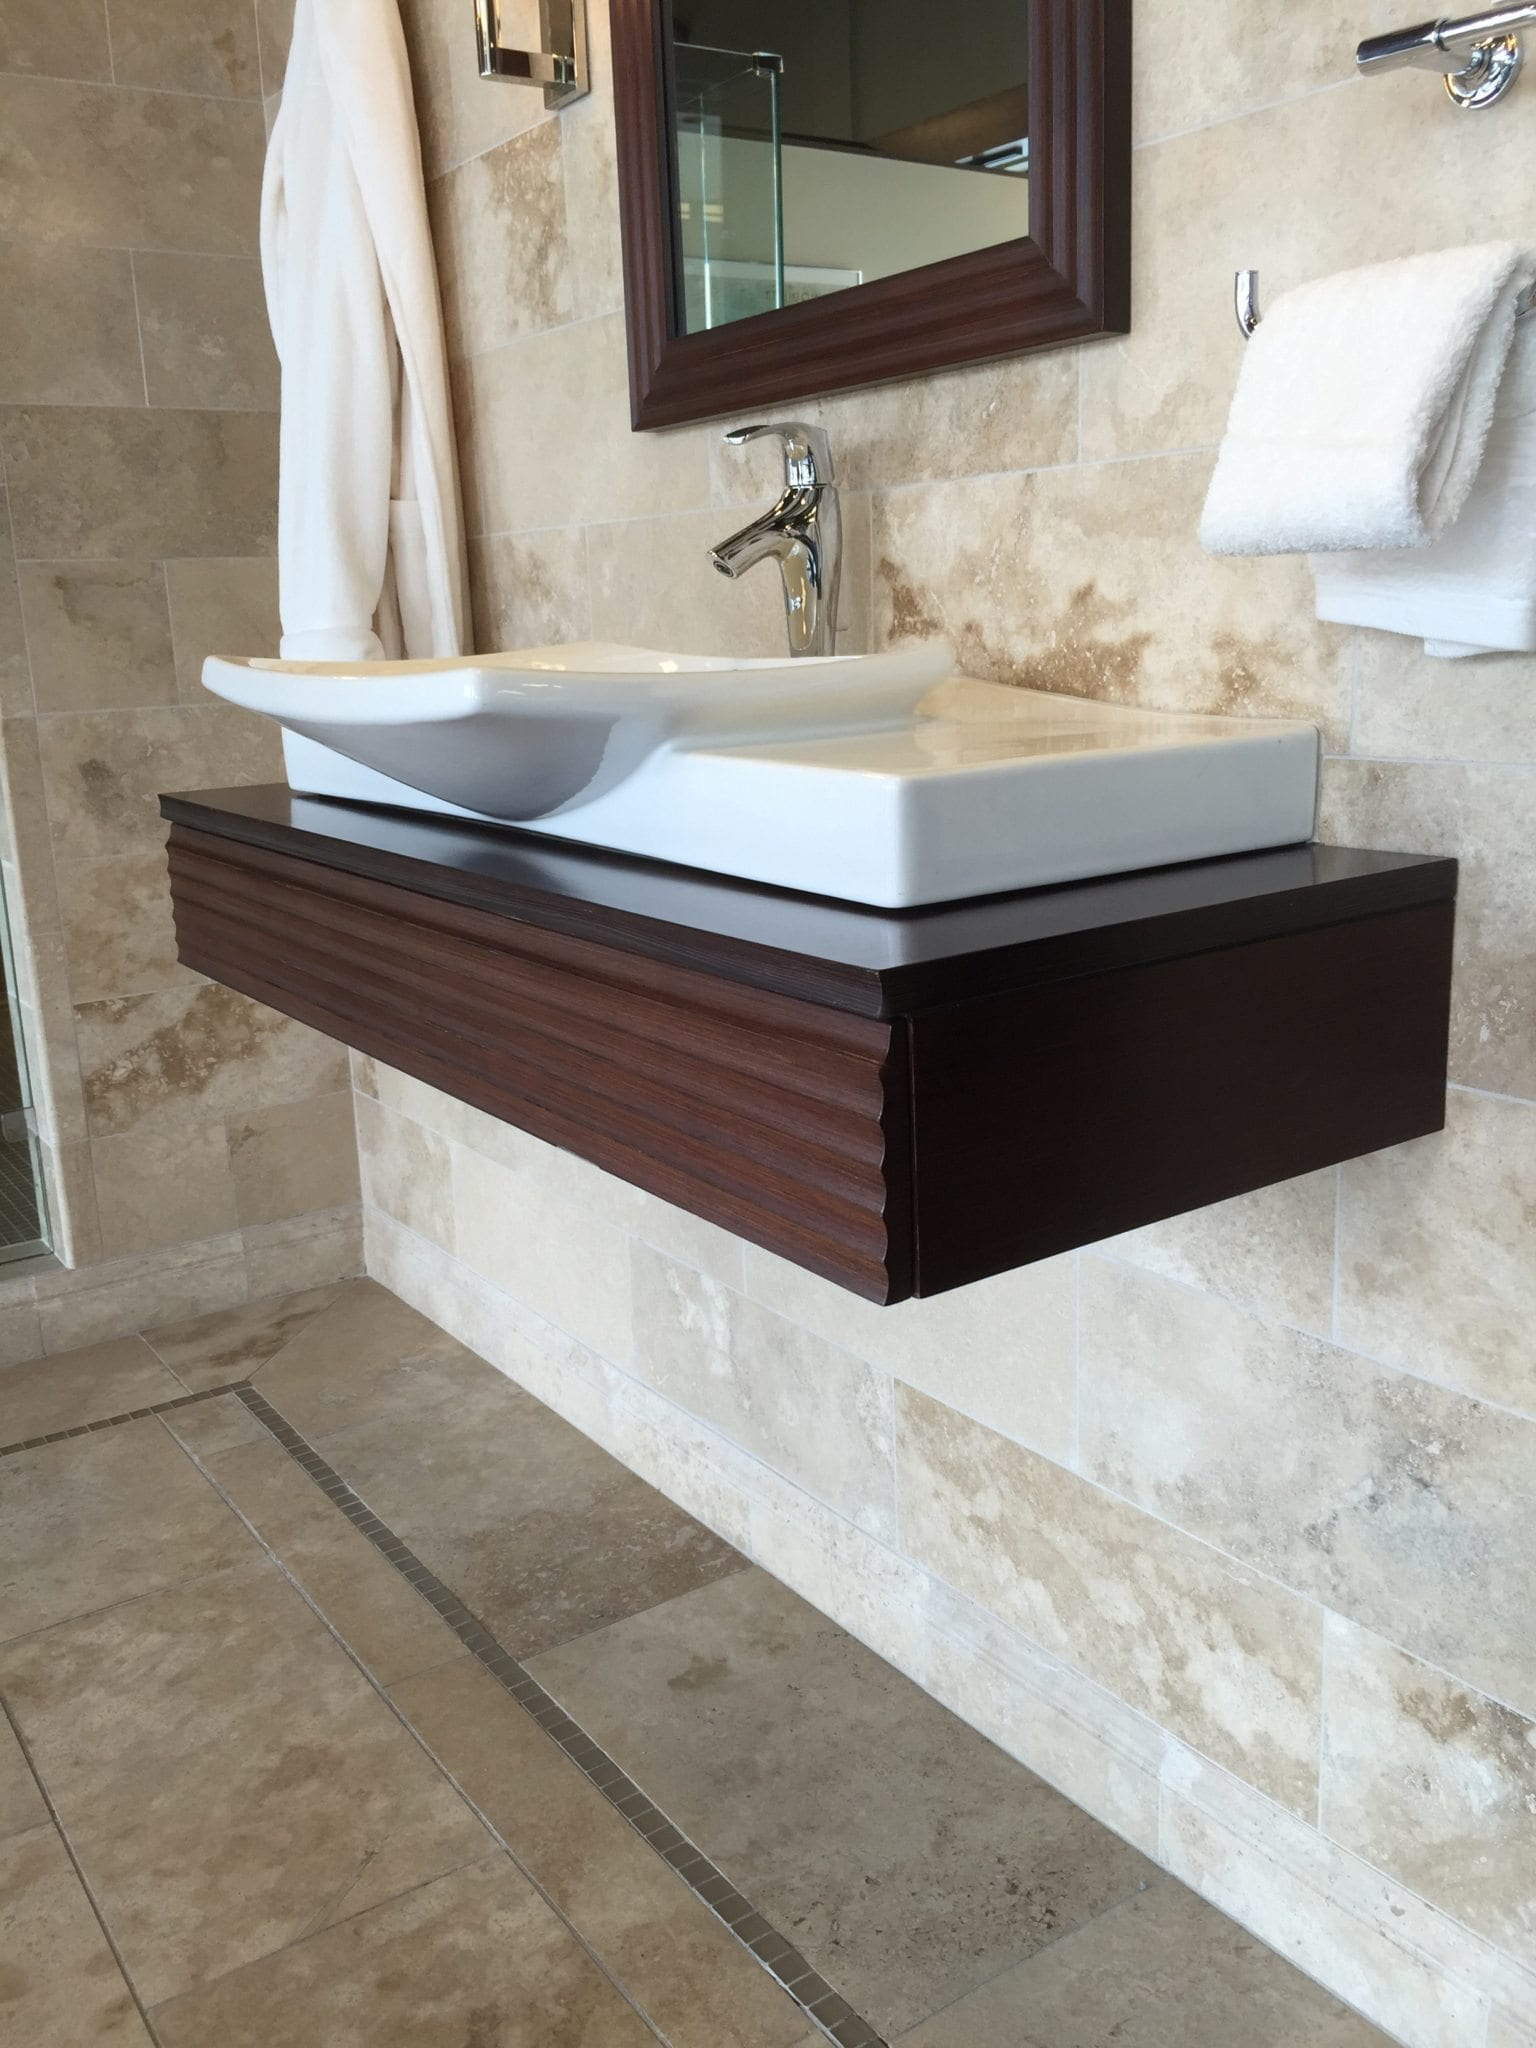 Lily Vanity Luxury Bathroom Products